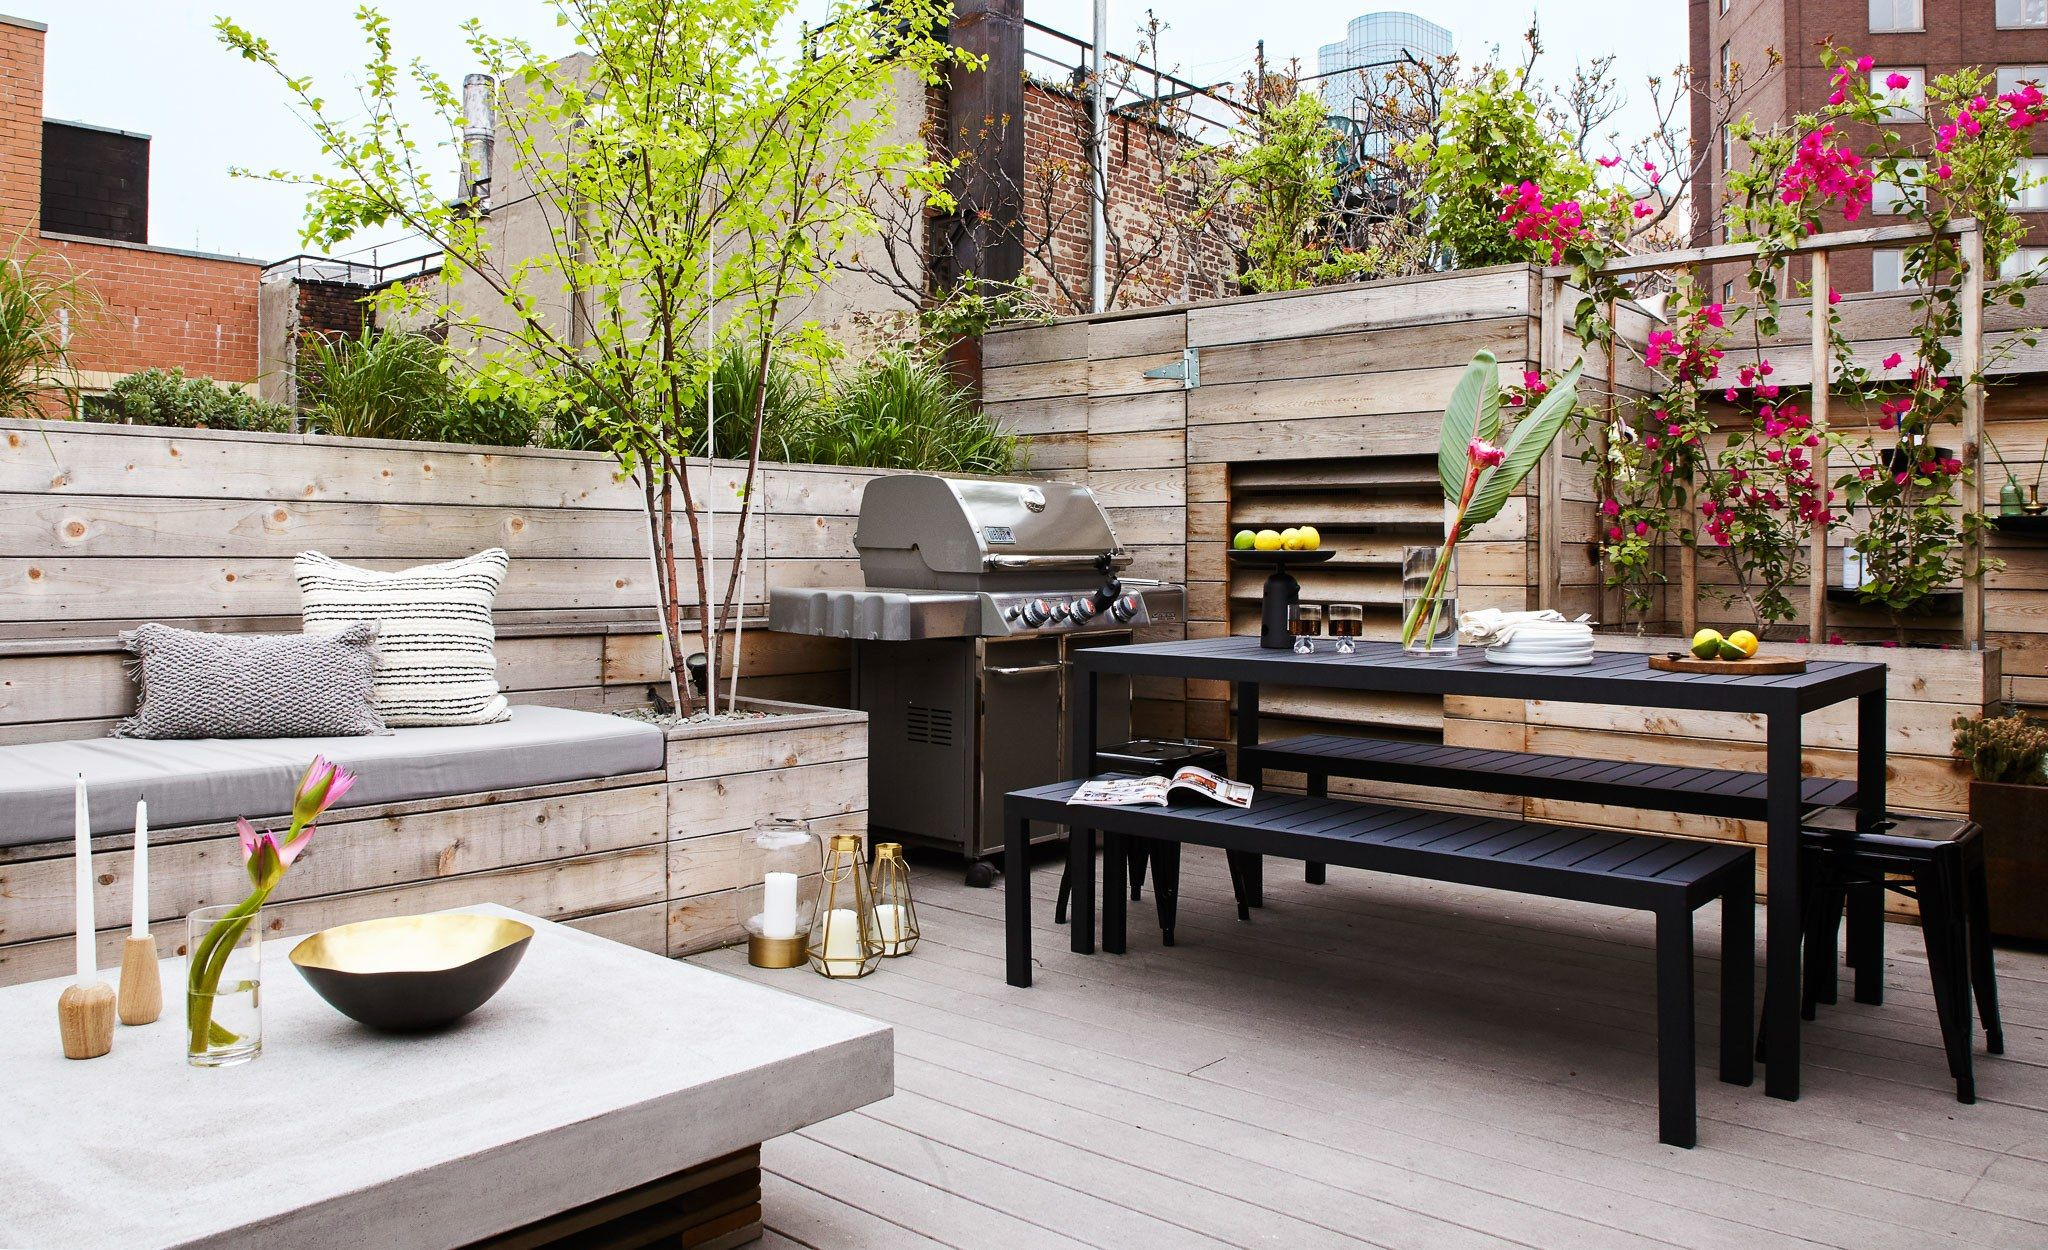 apartment patio privacy ideas wonderful manhattan   Hannah Bronfman and Brendan Fallis's New York City Triplex ...